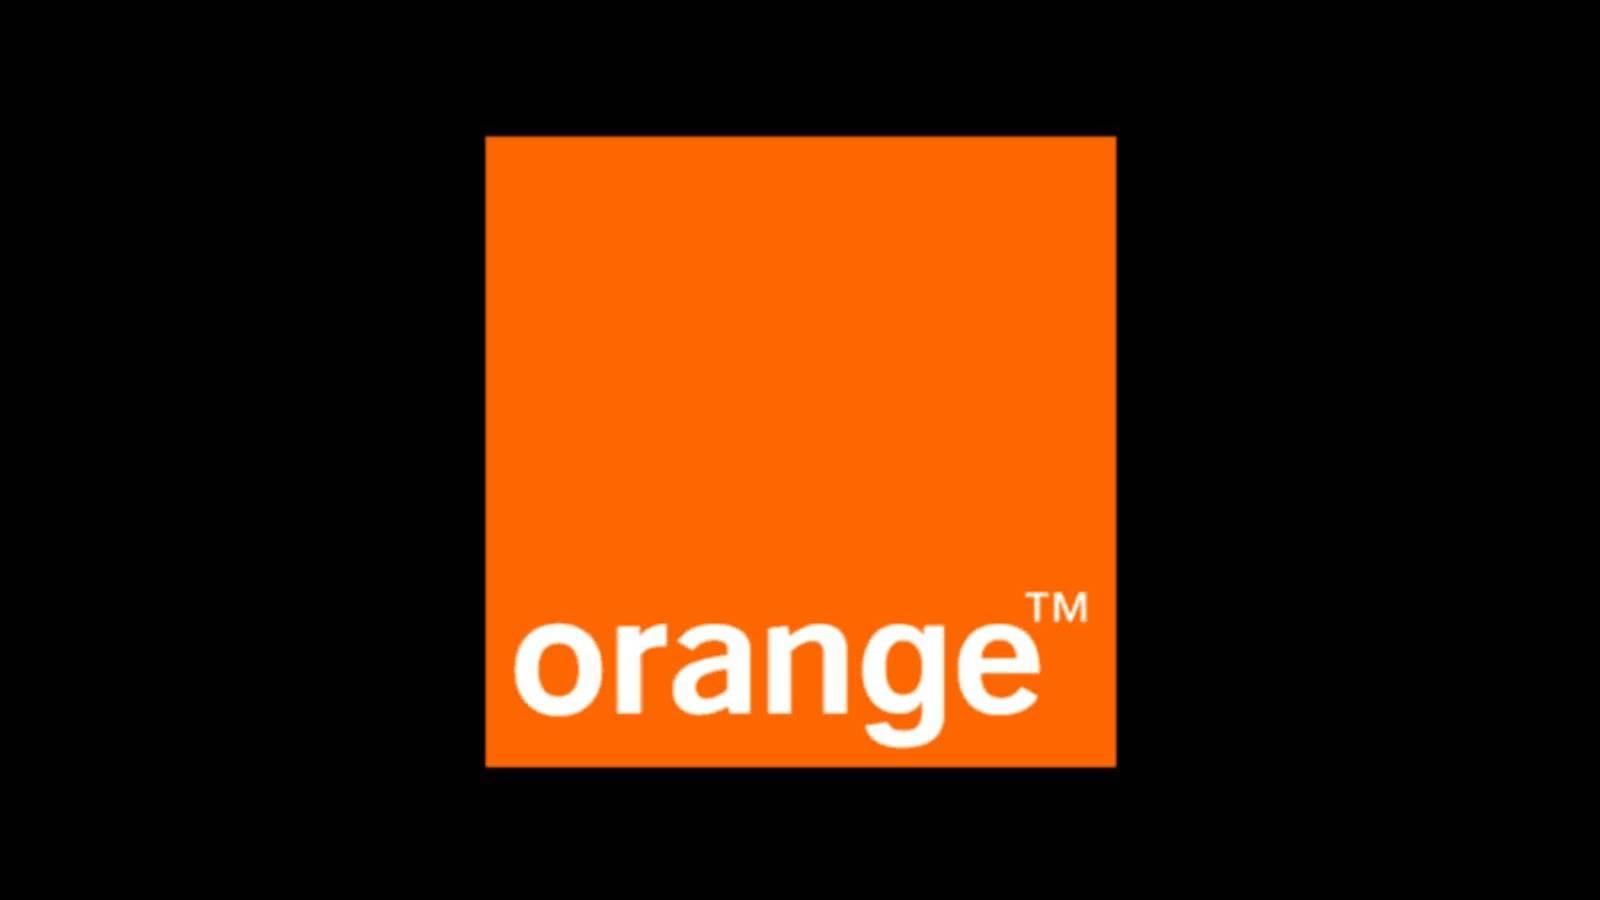 Orange proiectii